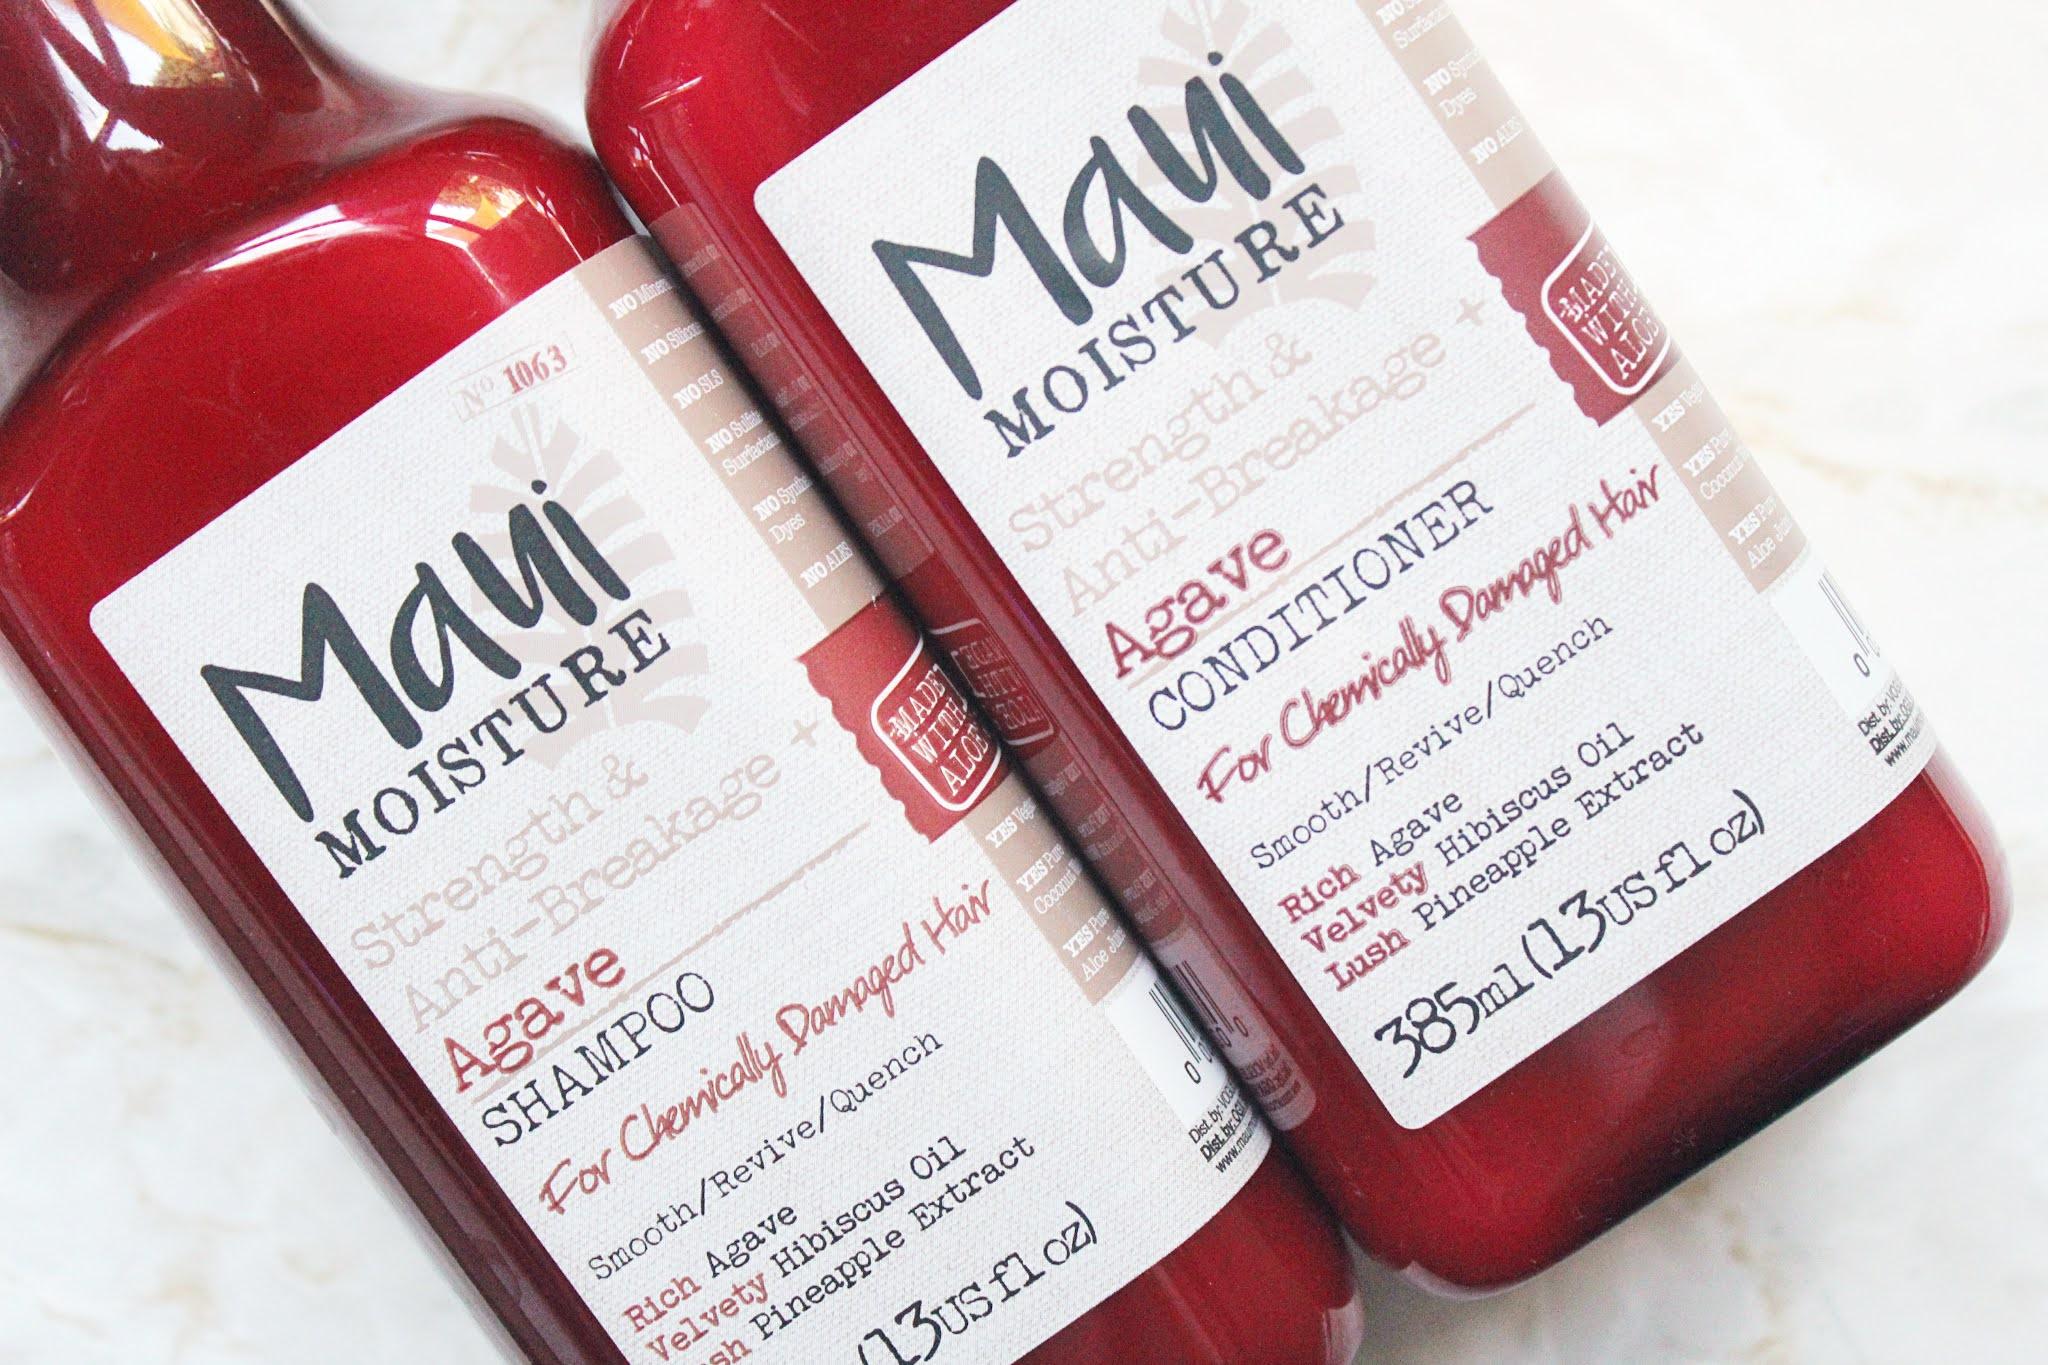 Maui Moisture Agave Shampoo & Conditioner Review